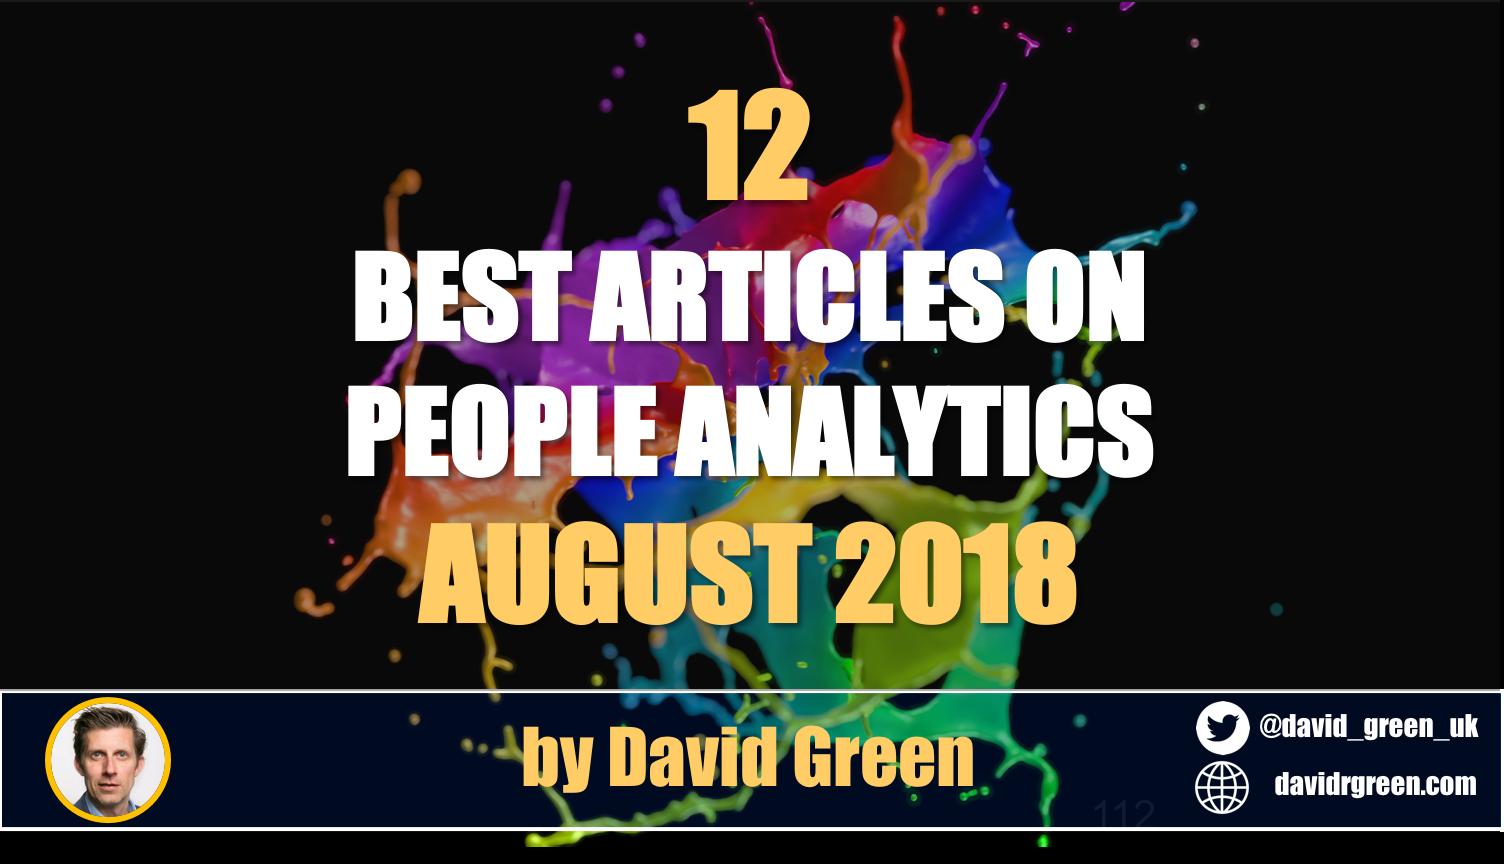 PA12_AUG_DAVID-GREEN_COVER.png